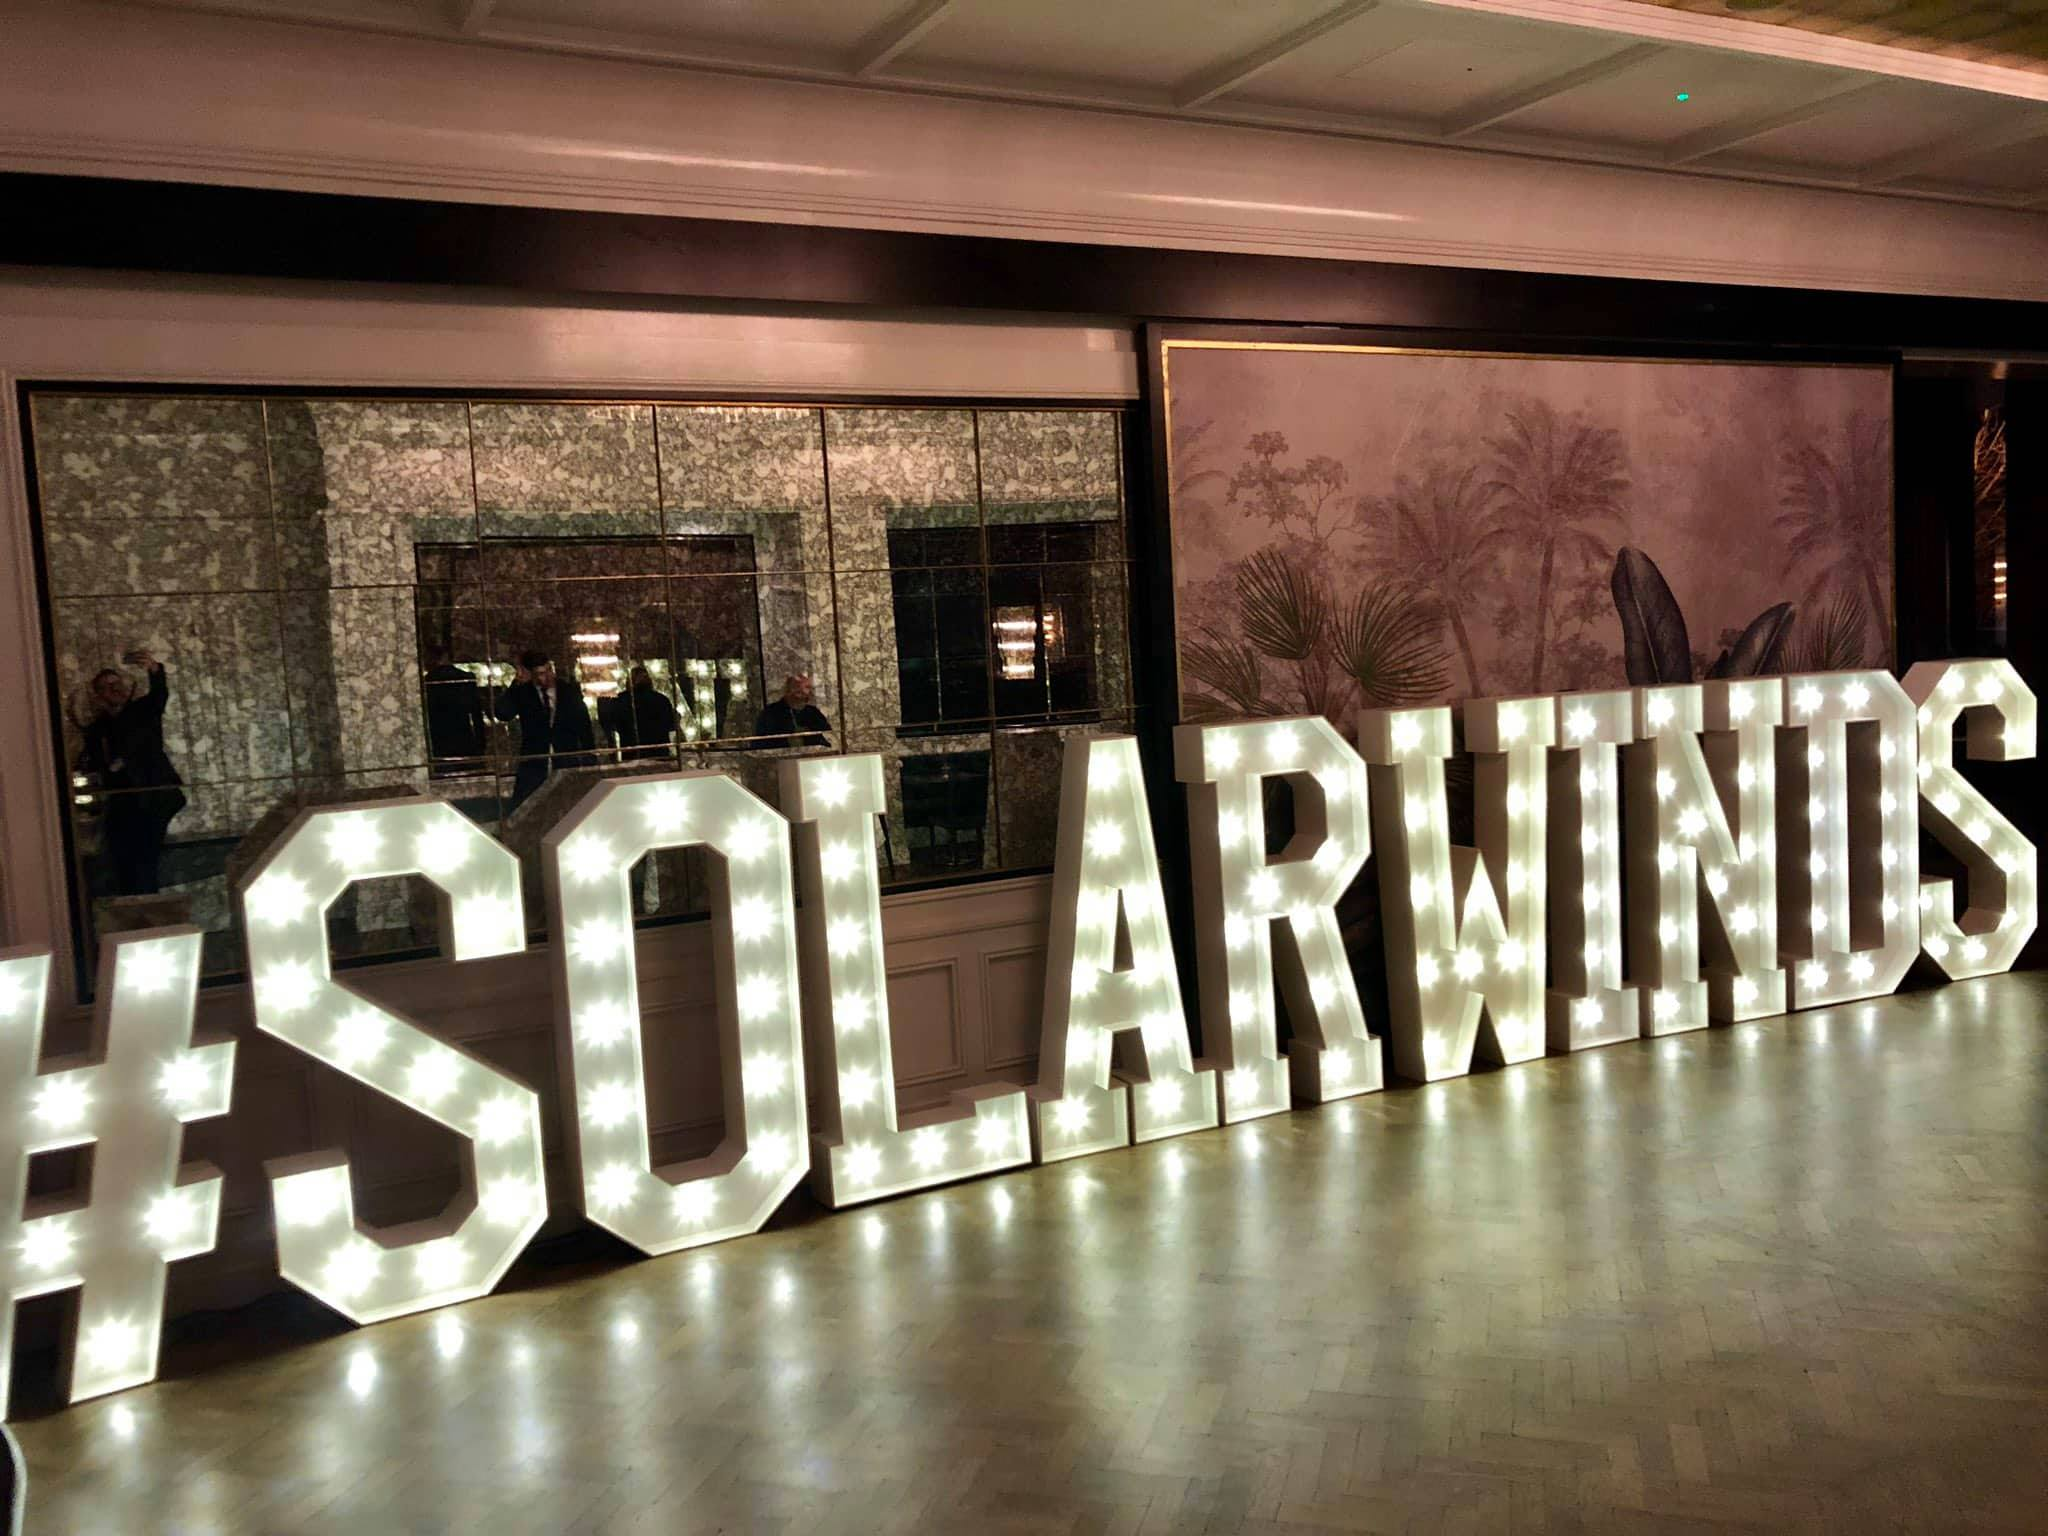 solarwinds river lee cork company branding signage team building awards conference